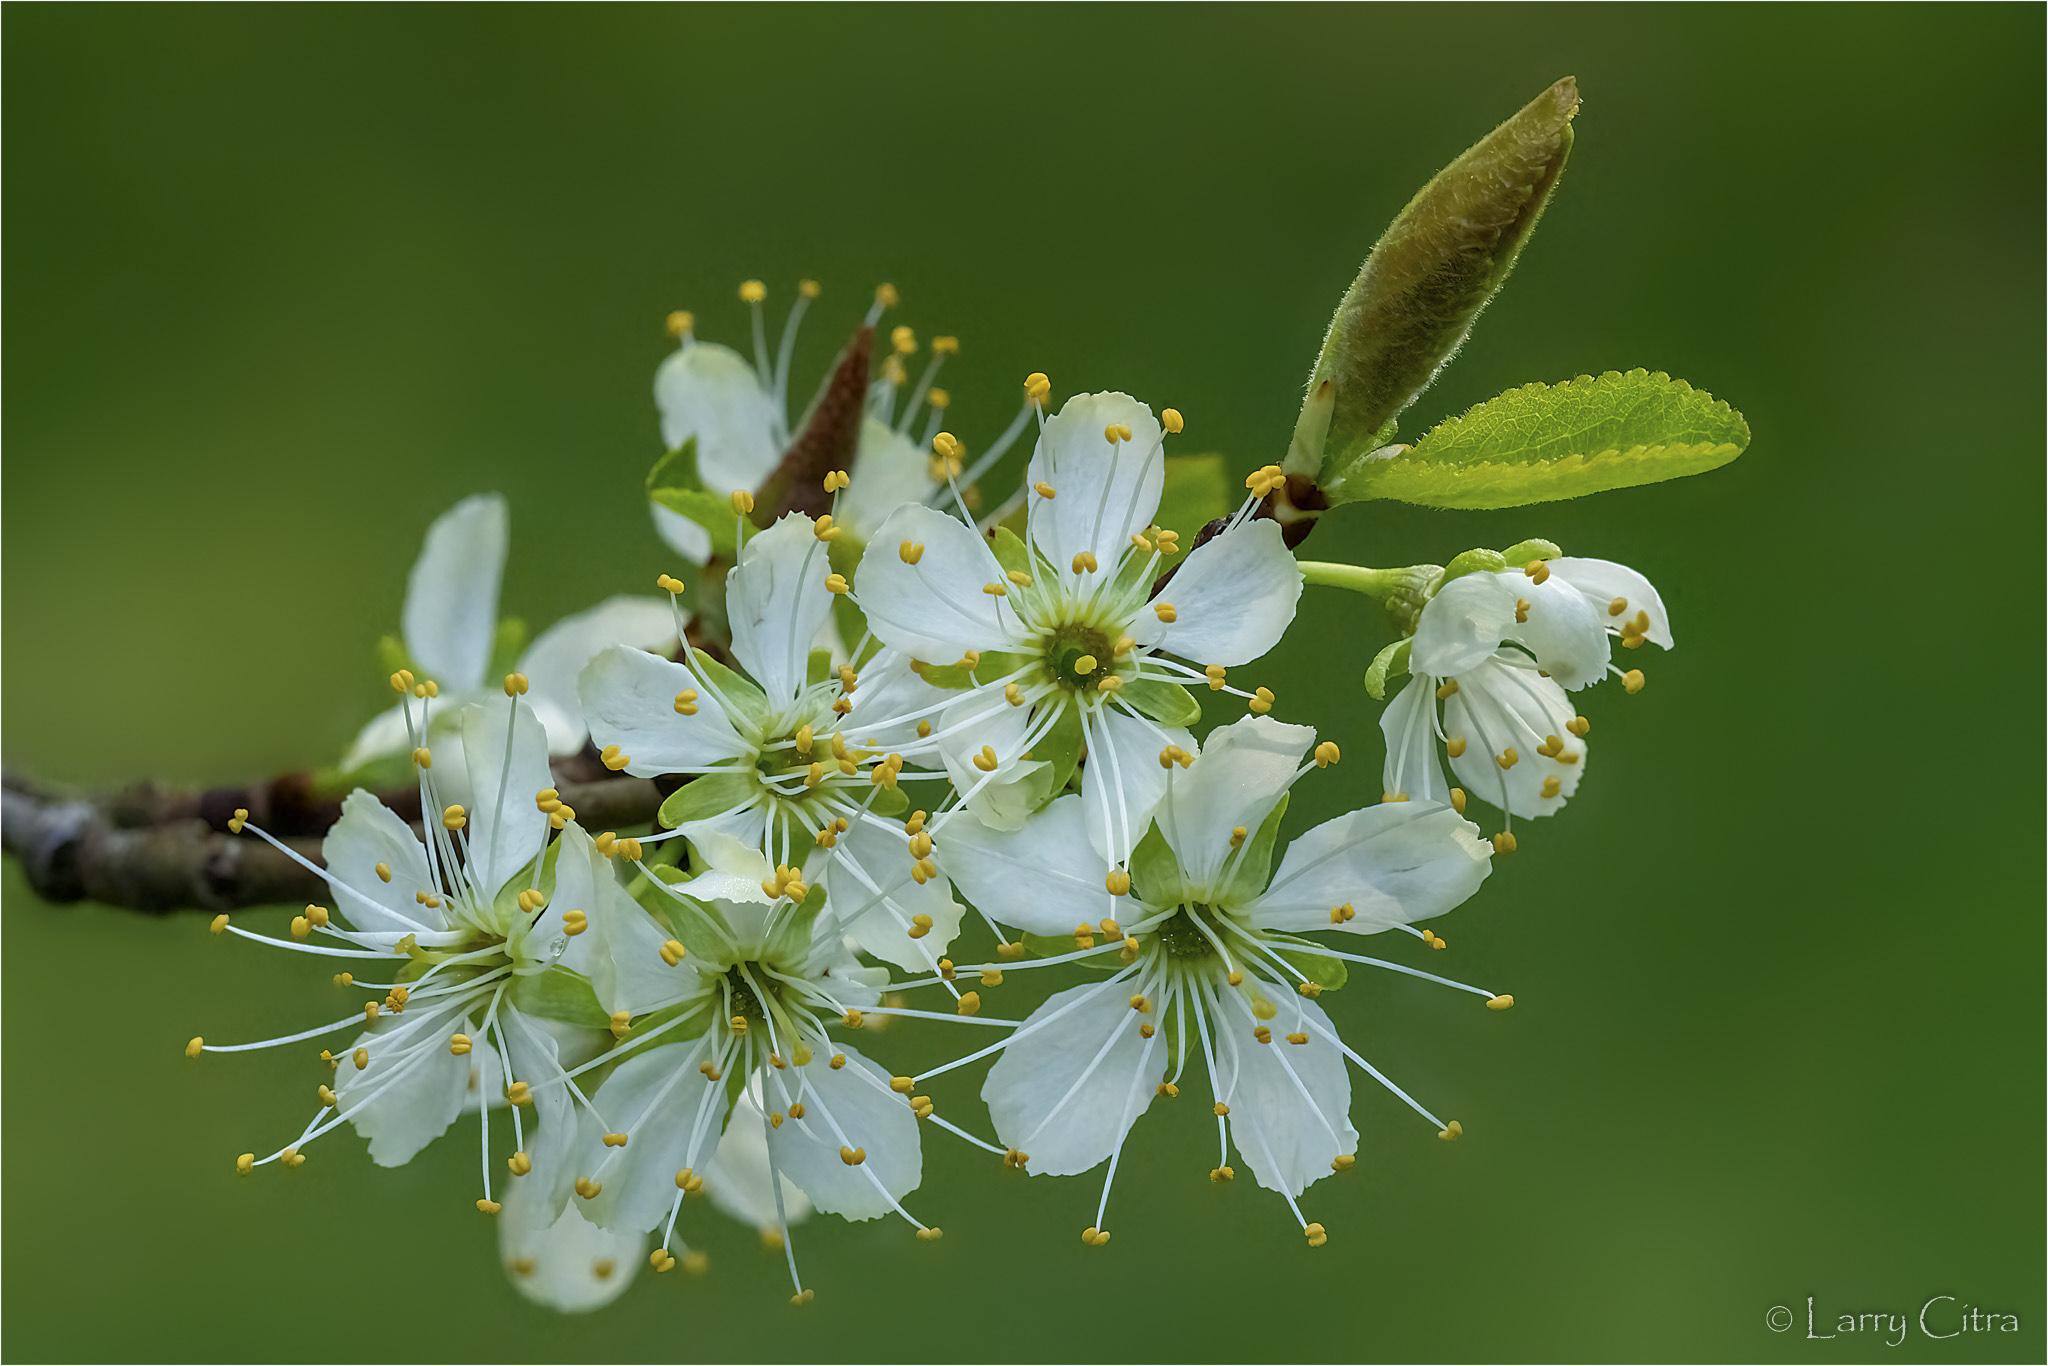 Larry Citra © Apple Blossoms